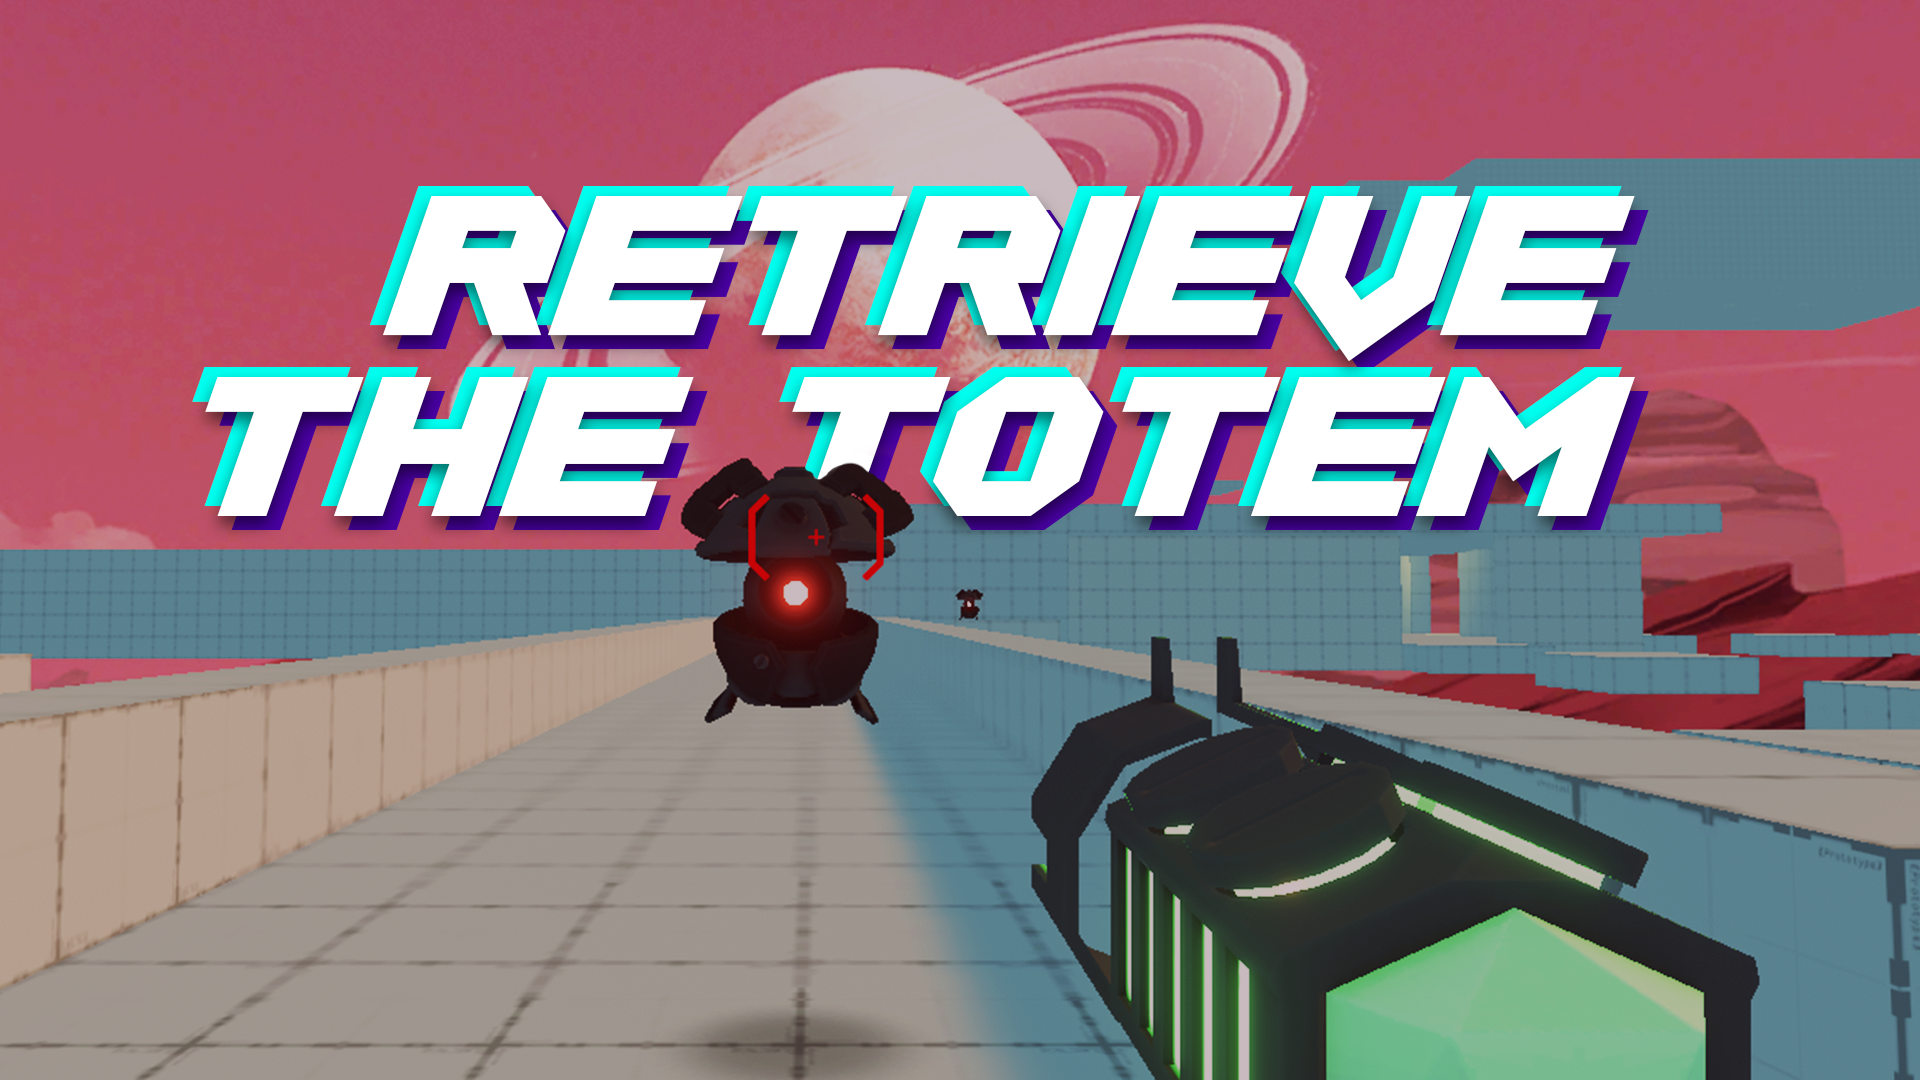 Retrieve the Totem!